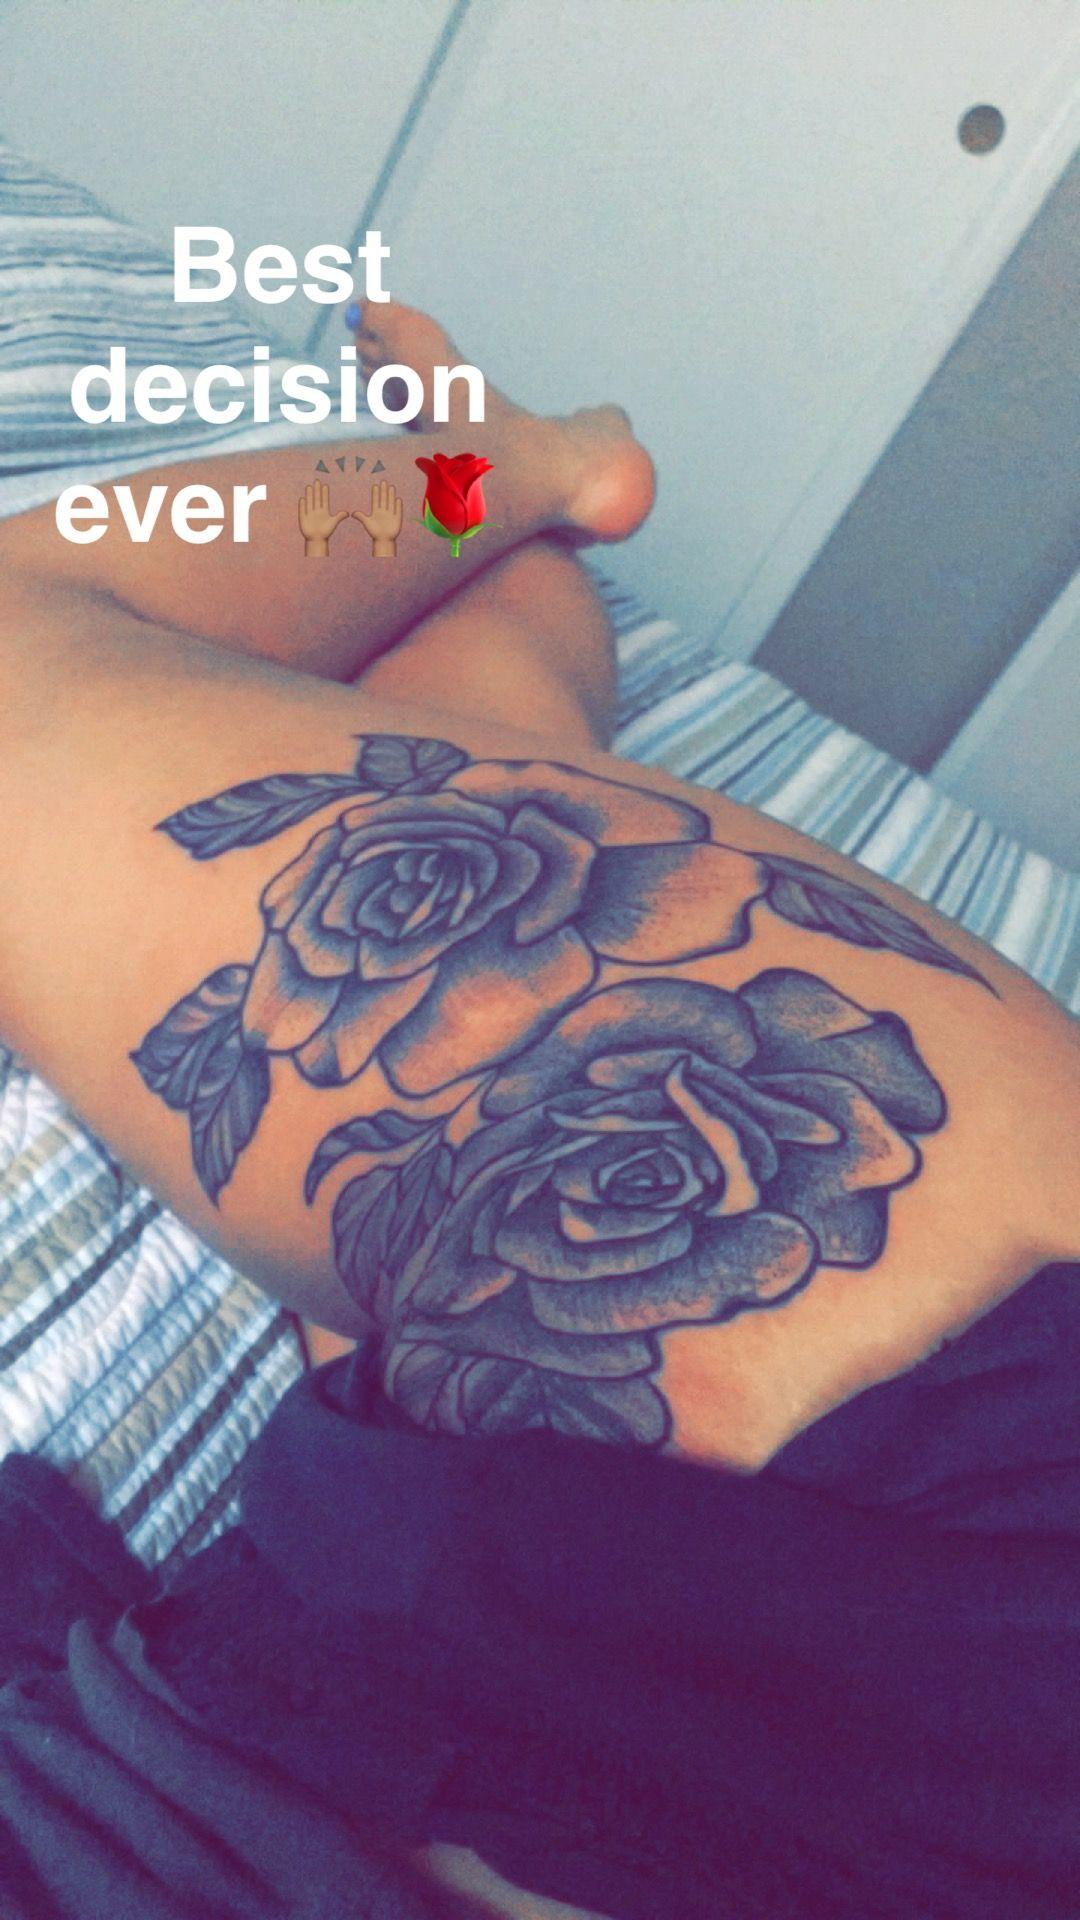 Rose Thigh Tattoo | Tattoos I need | Pinterest | Rose ...